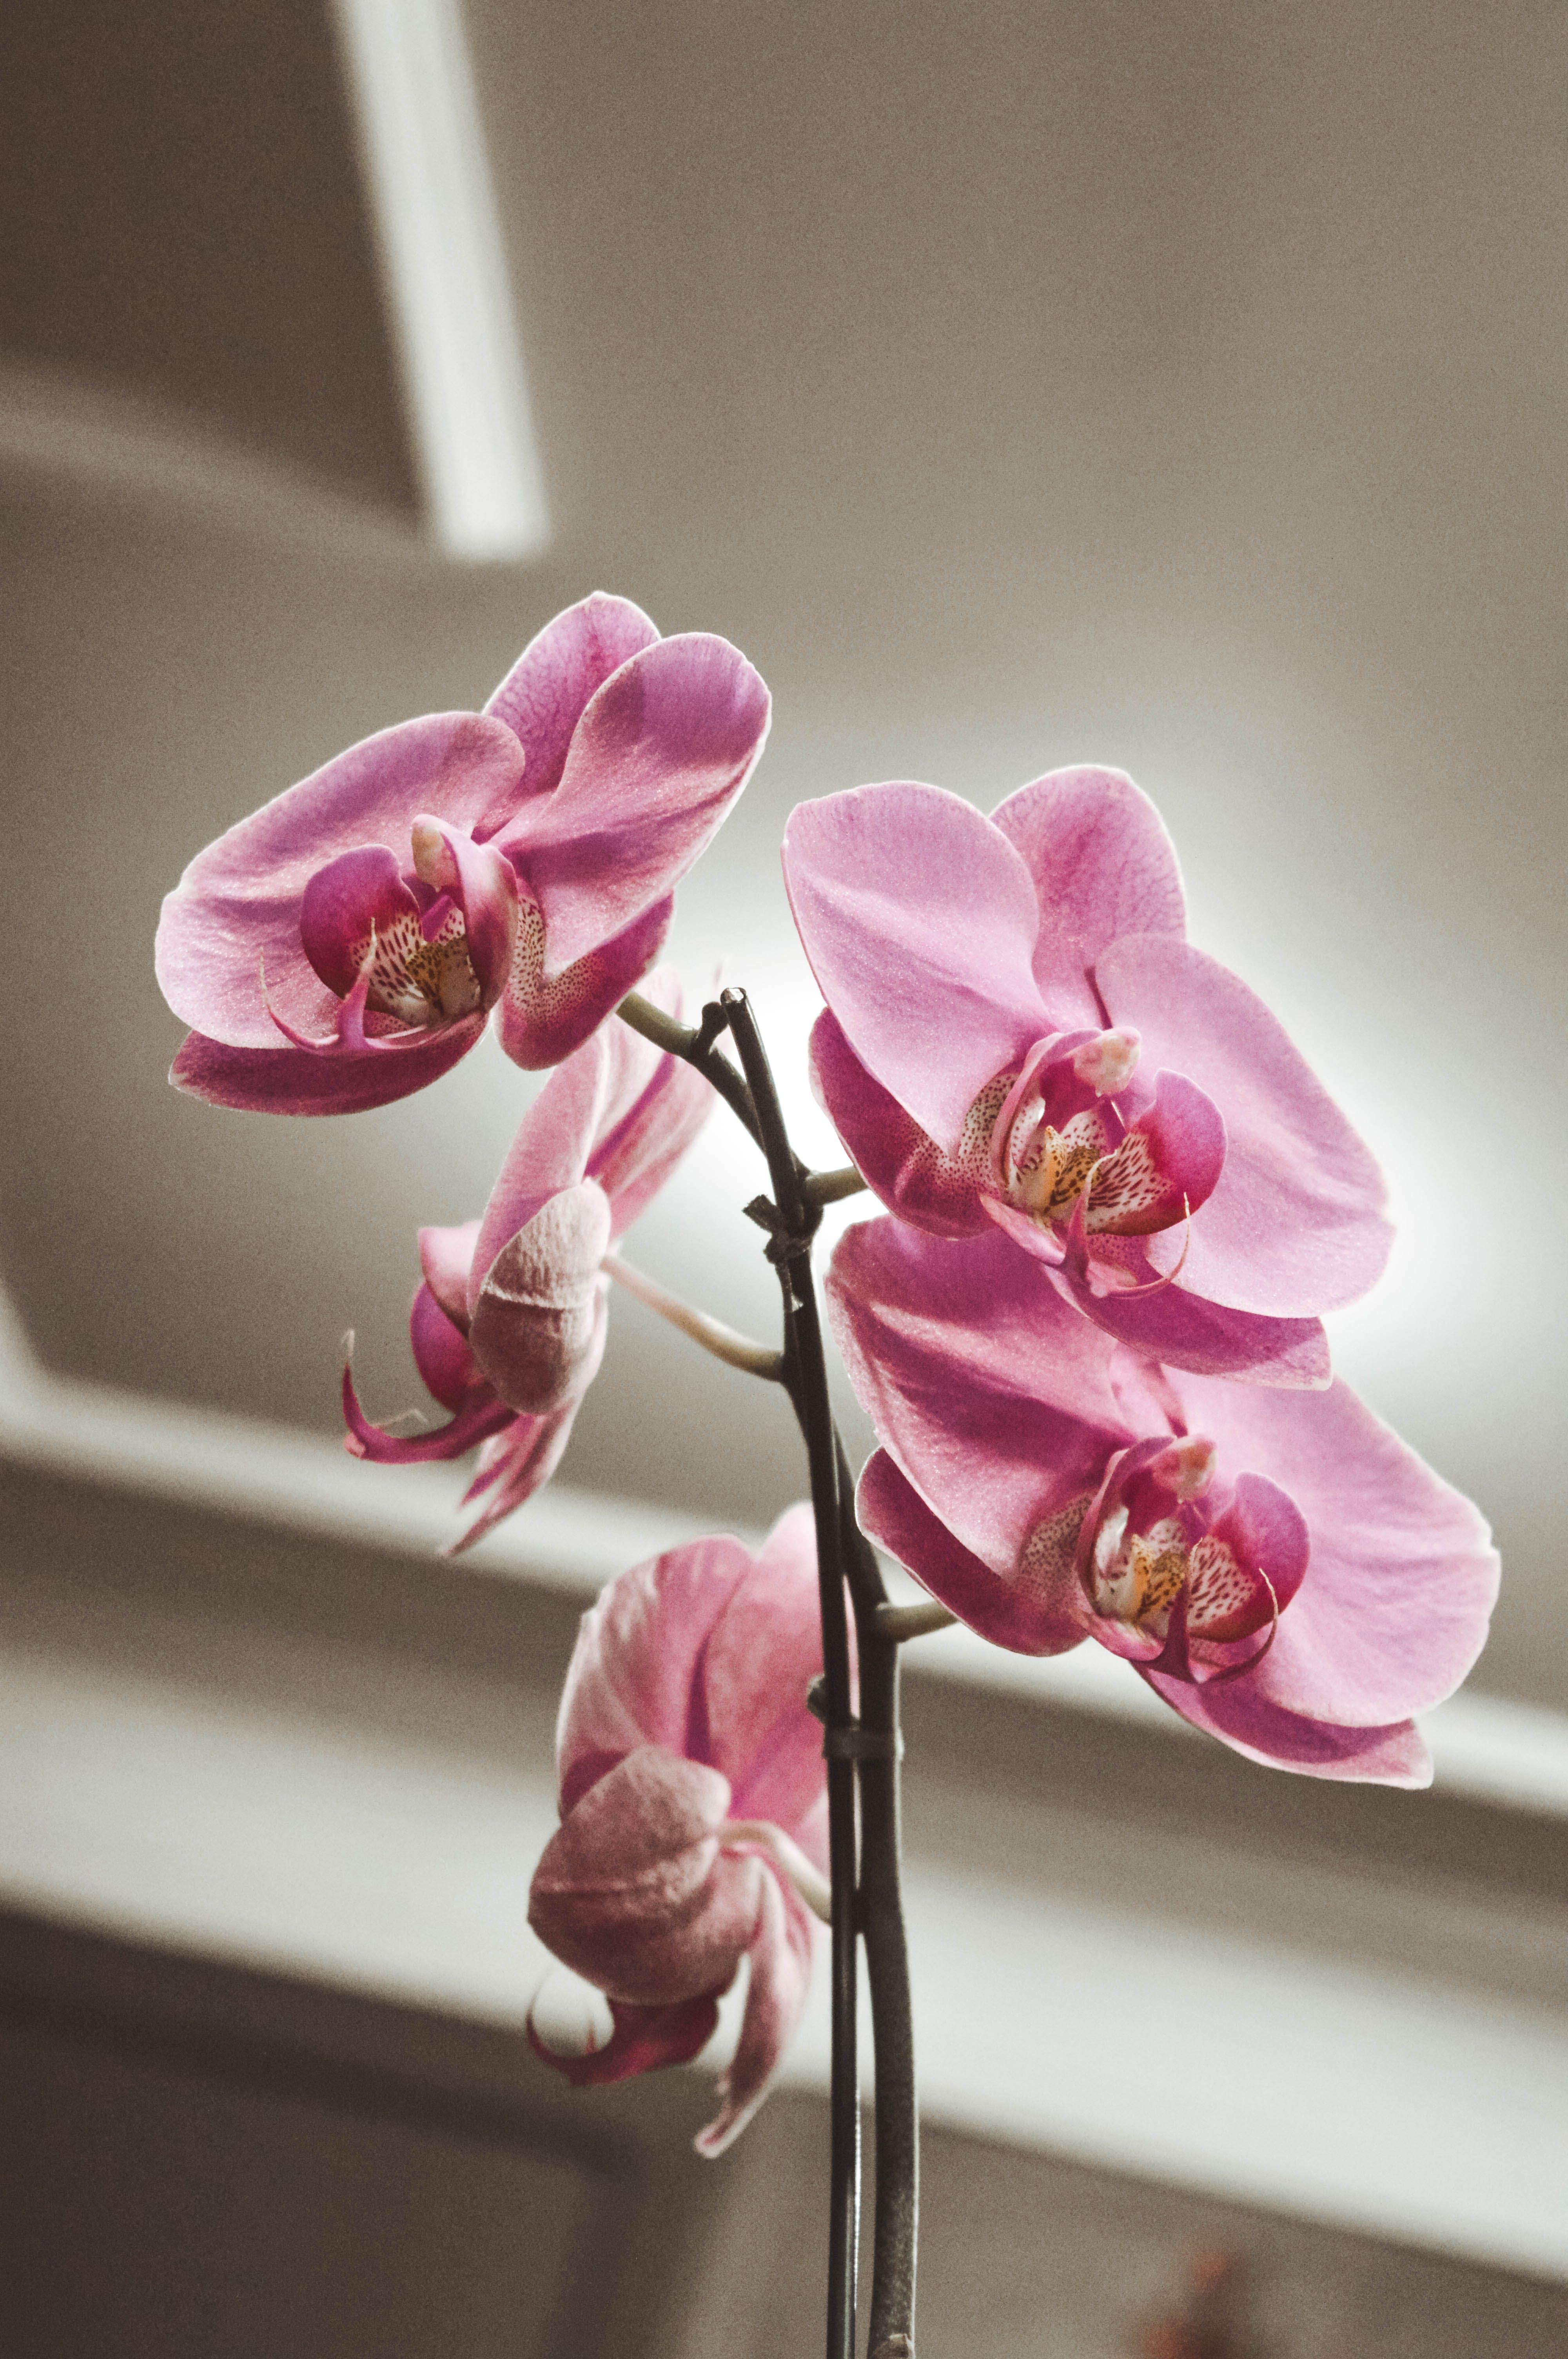 Kostenloses Stock Foto zu blumen, frühling, frühlingsblumen, lila orchidee